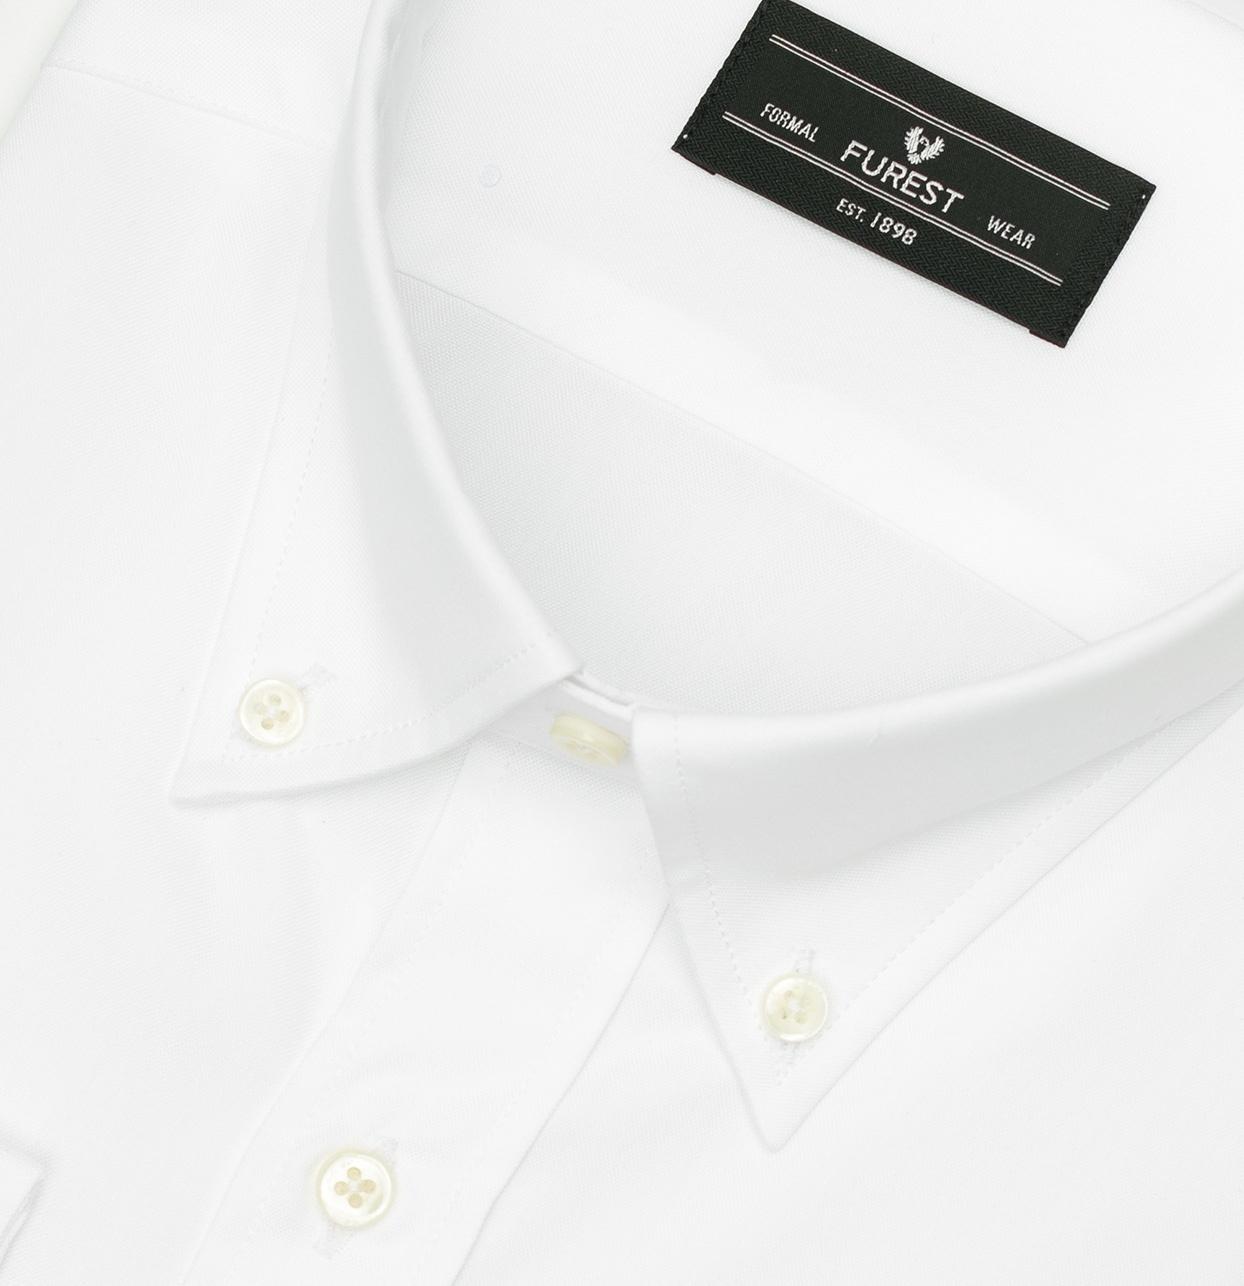 Camisa Formal Wear REGULAR FIT Modelo BOTTON DOWN Tejido Pin point color blanco, 100% Algodón - Ítem2